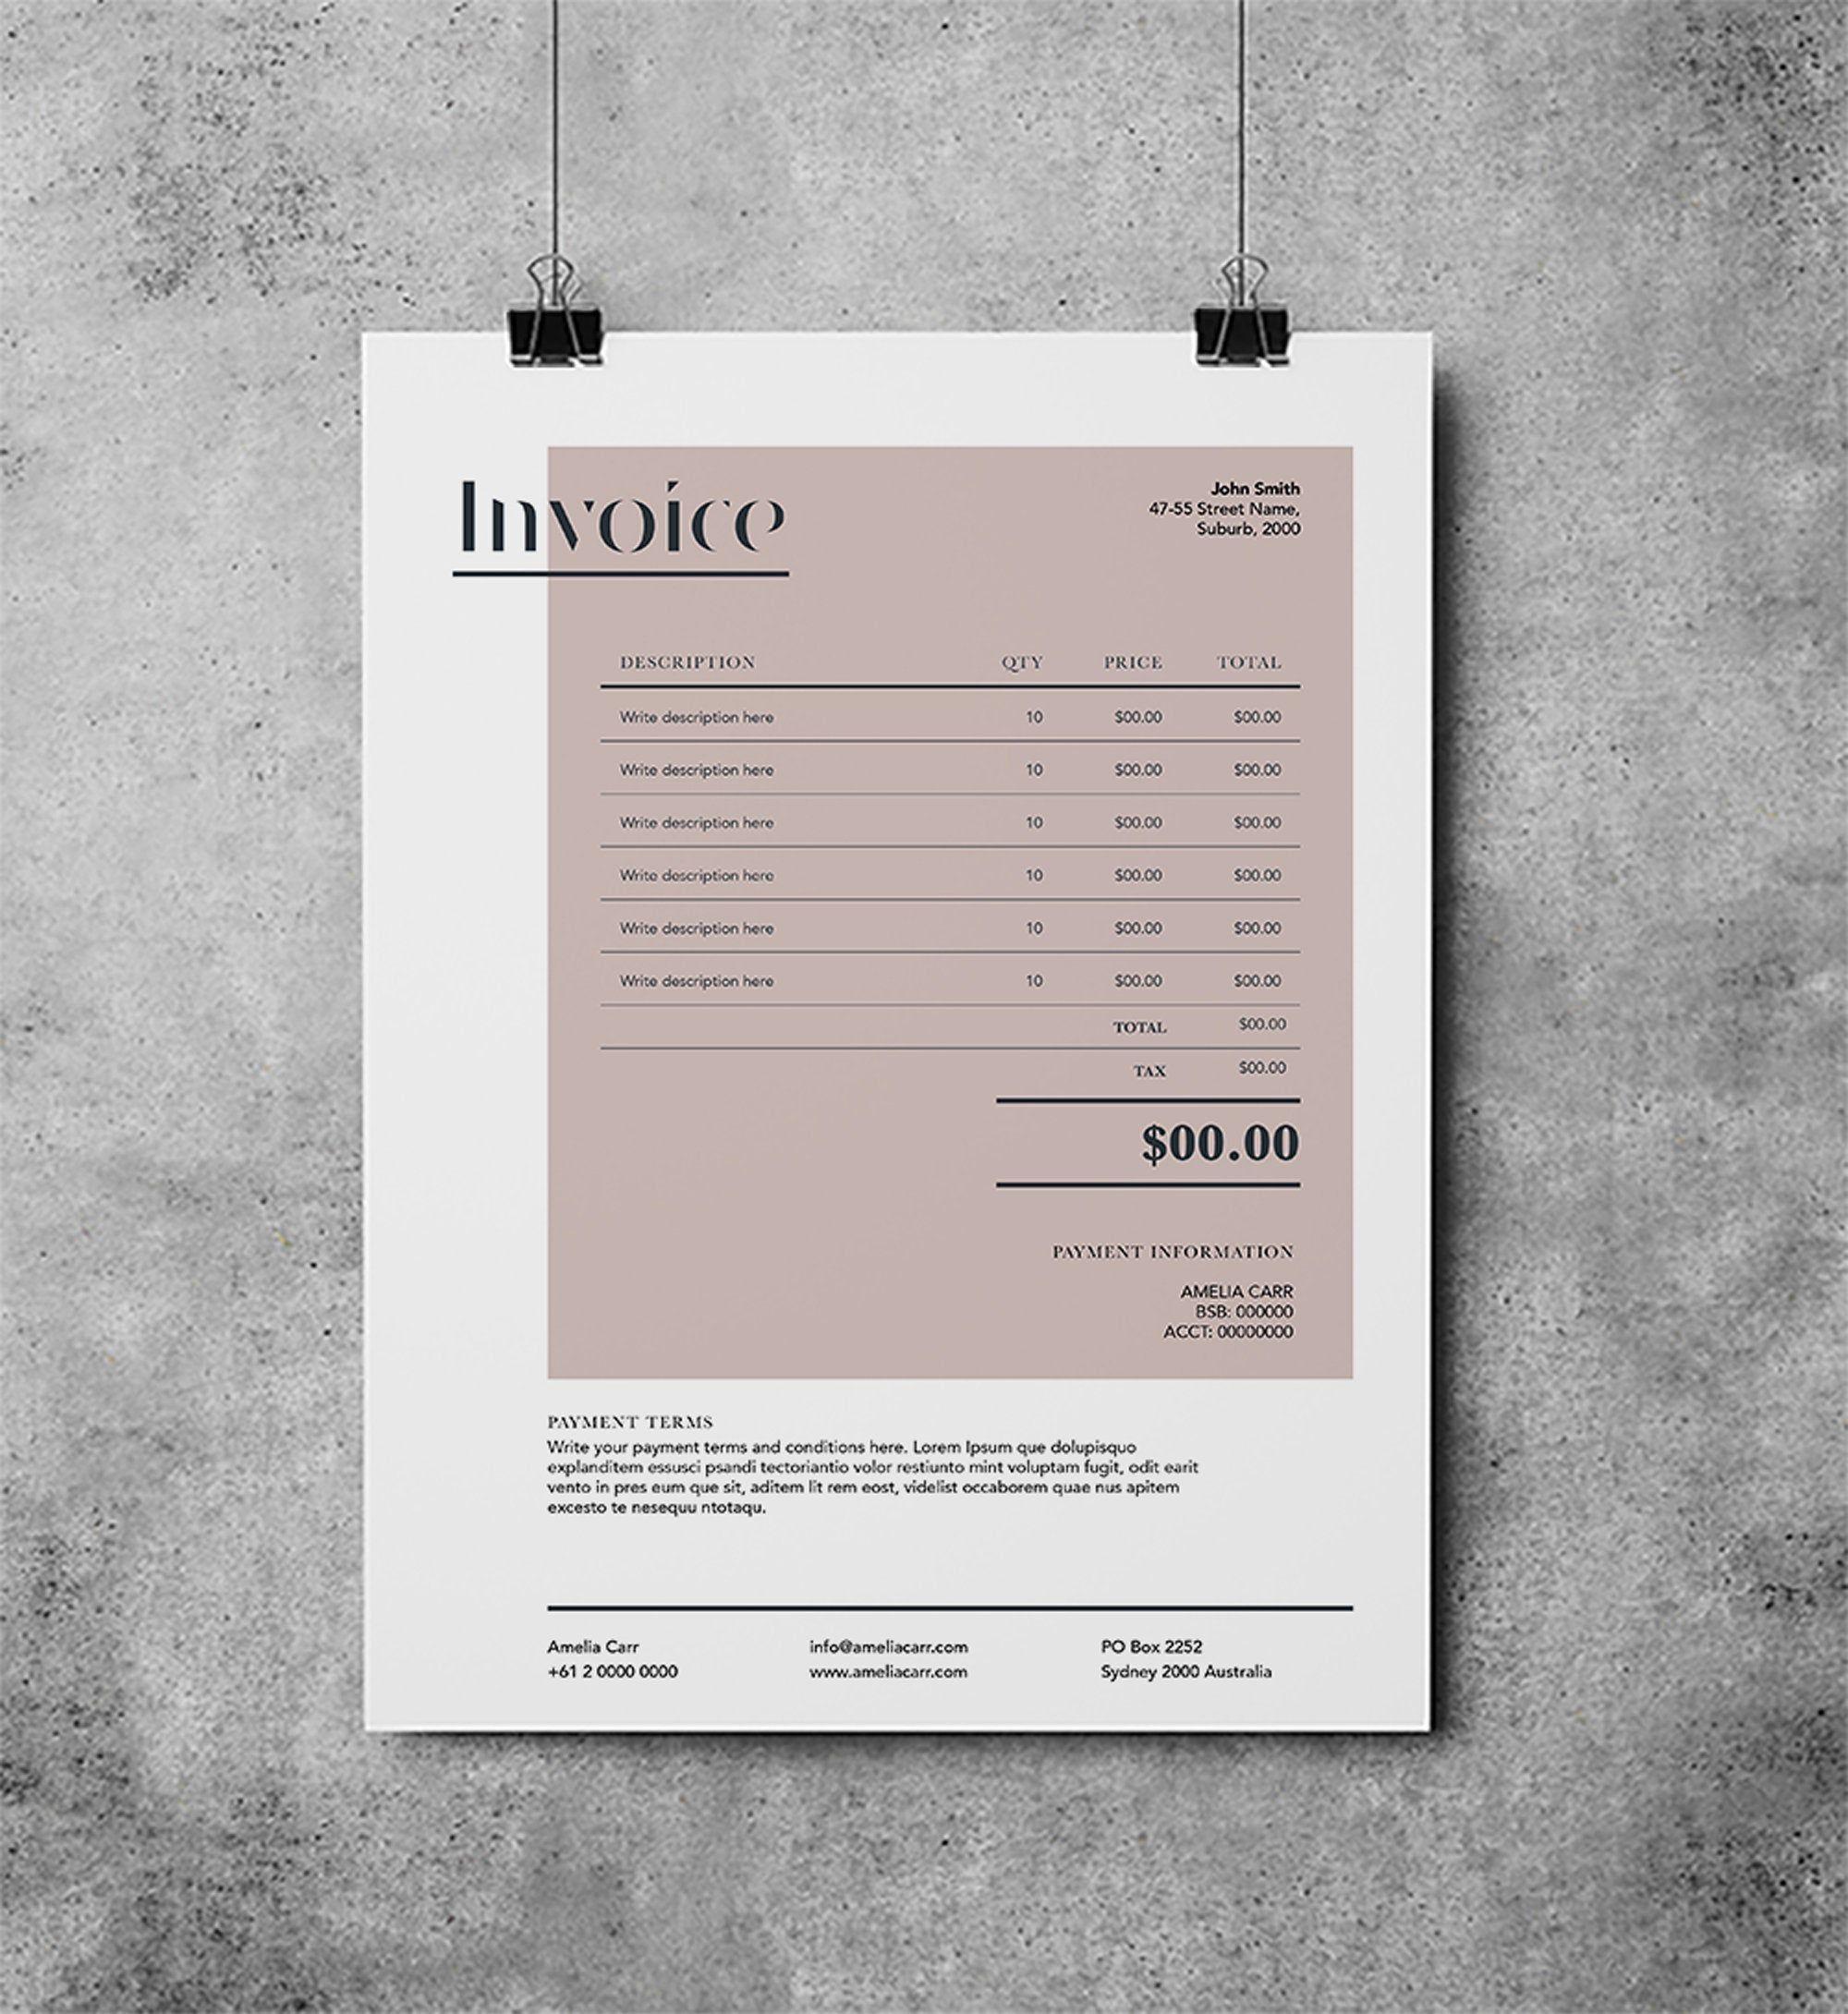 The Amelia Carr Invoice Template Modern Invoice Template Design In 2021 Invoice Design Template Invoice Design Invoice Template